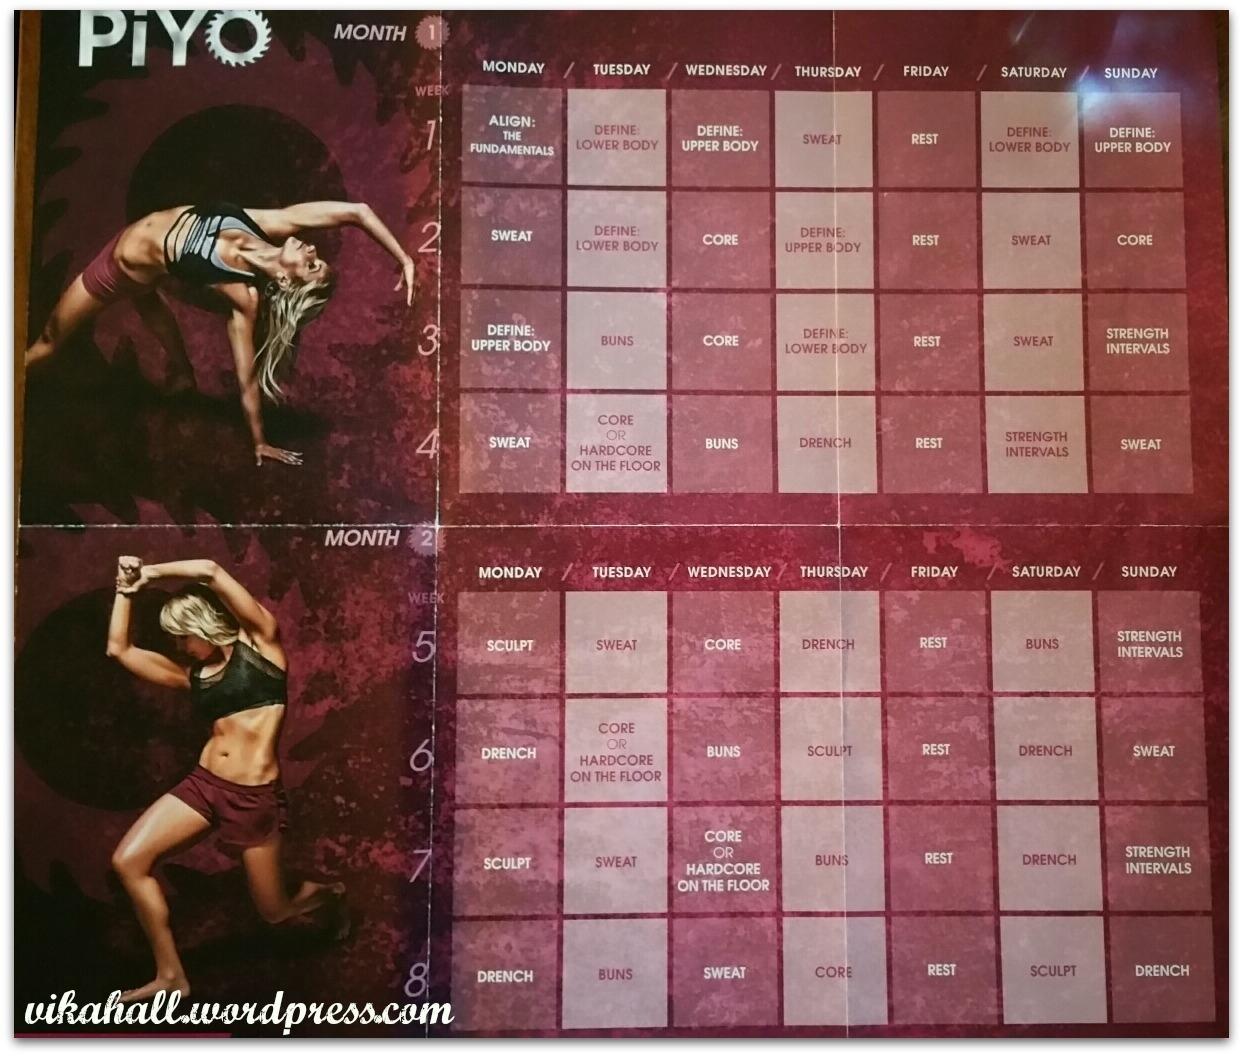 My 60 Days Of Piyo-Fication – The Joy Of Fit Piyo Calendar Month 3